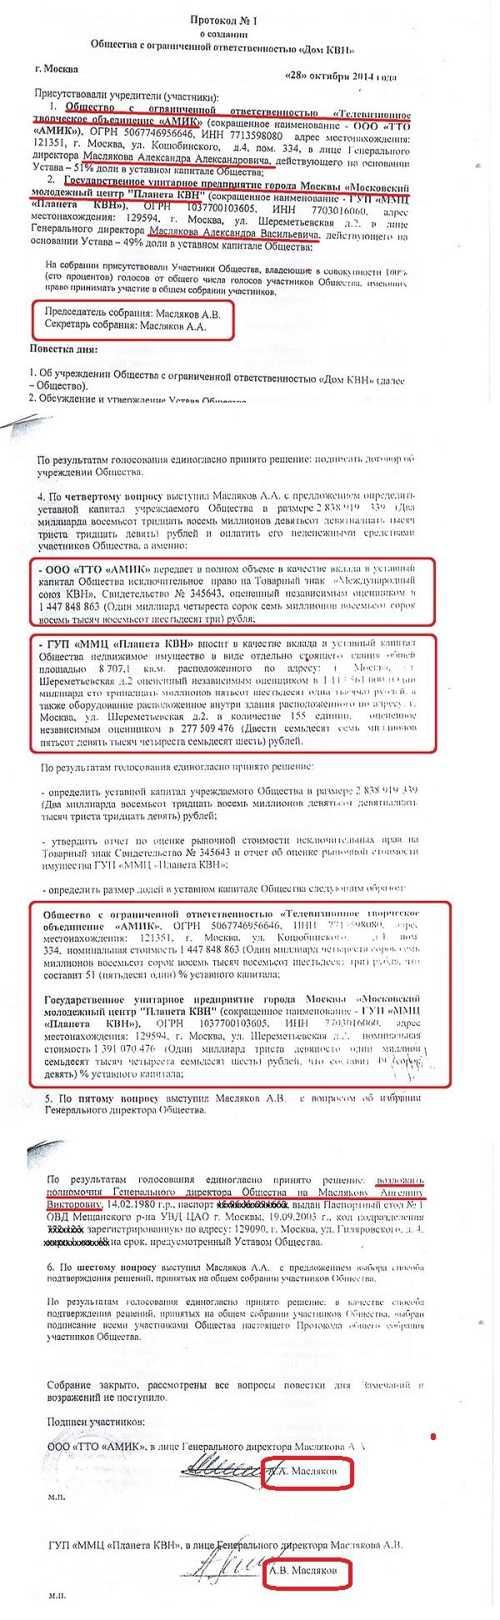 КВН (Кто Взял Недвижимость)